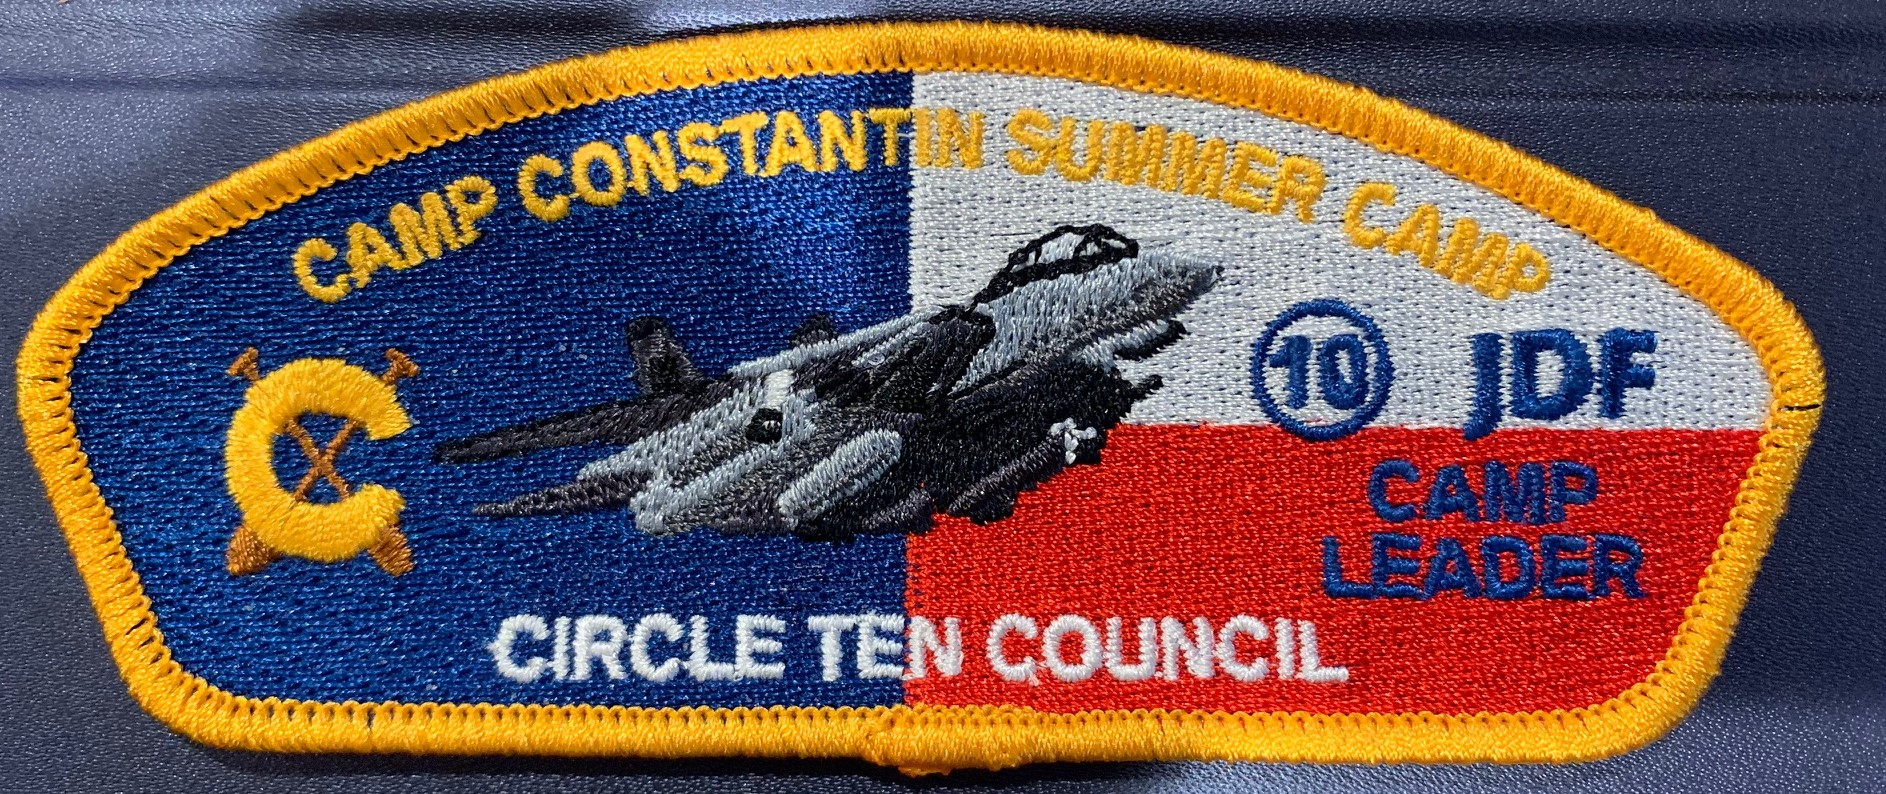 This year's Camp Leader council strip — the camp theme was Top Gun…